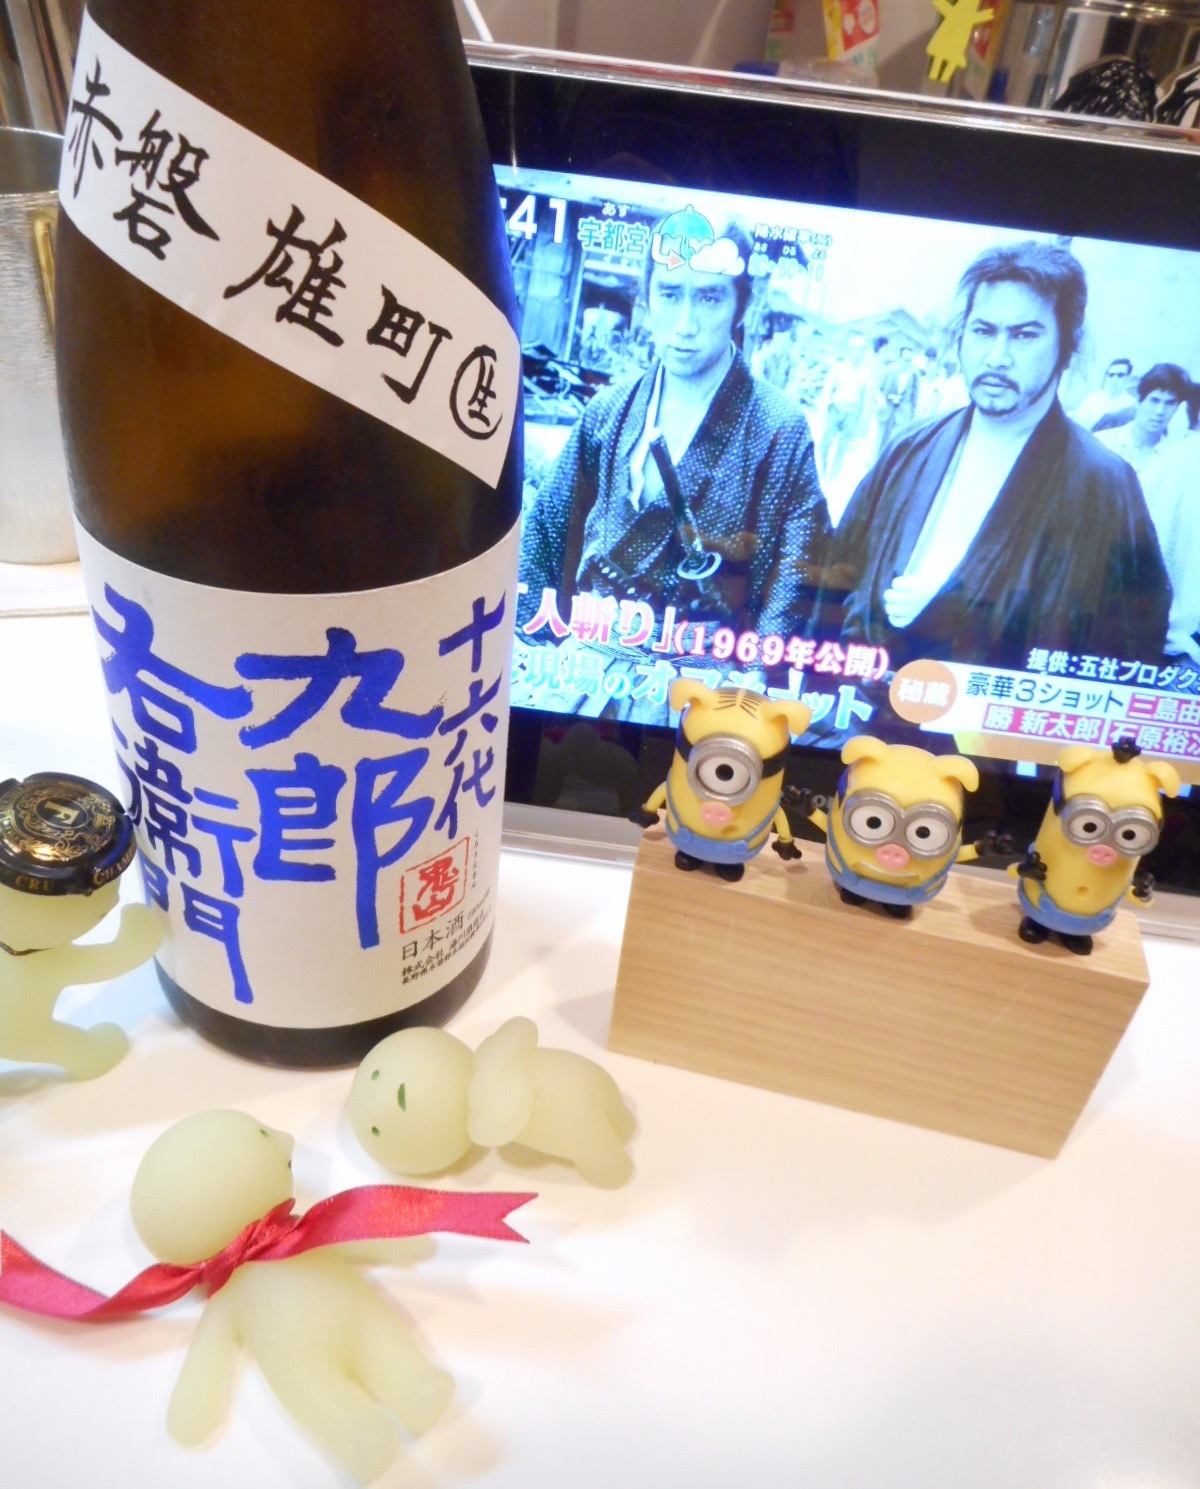 kuroemon_yamahai_omachi28by3.jpg